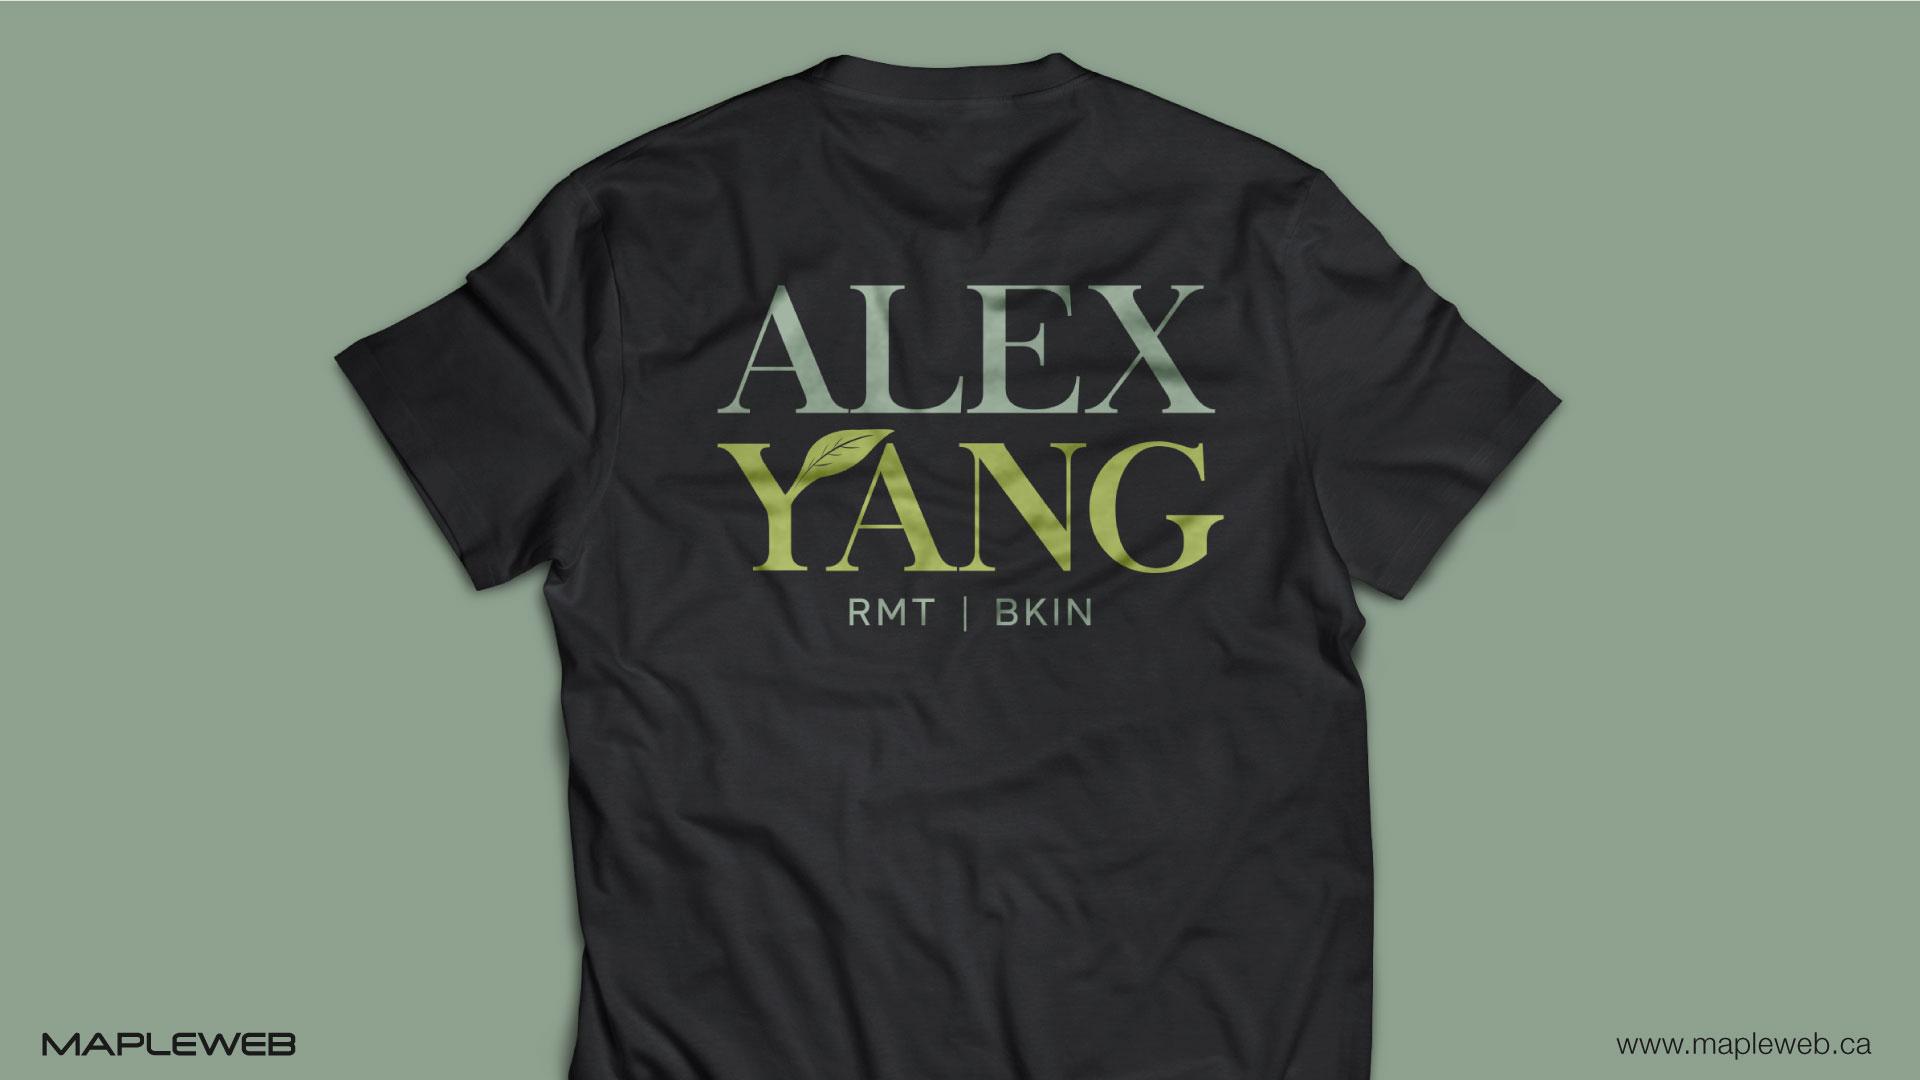 alex-yang-brand-logo-design-by-mapleweb-vancouver-canada-header-t-shirt-mock